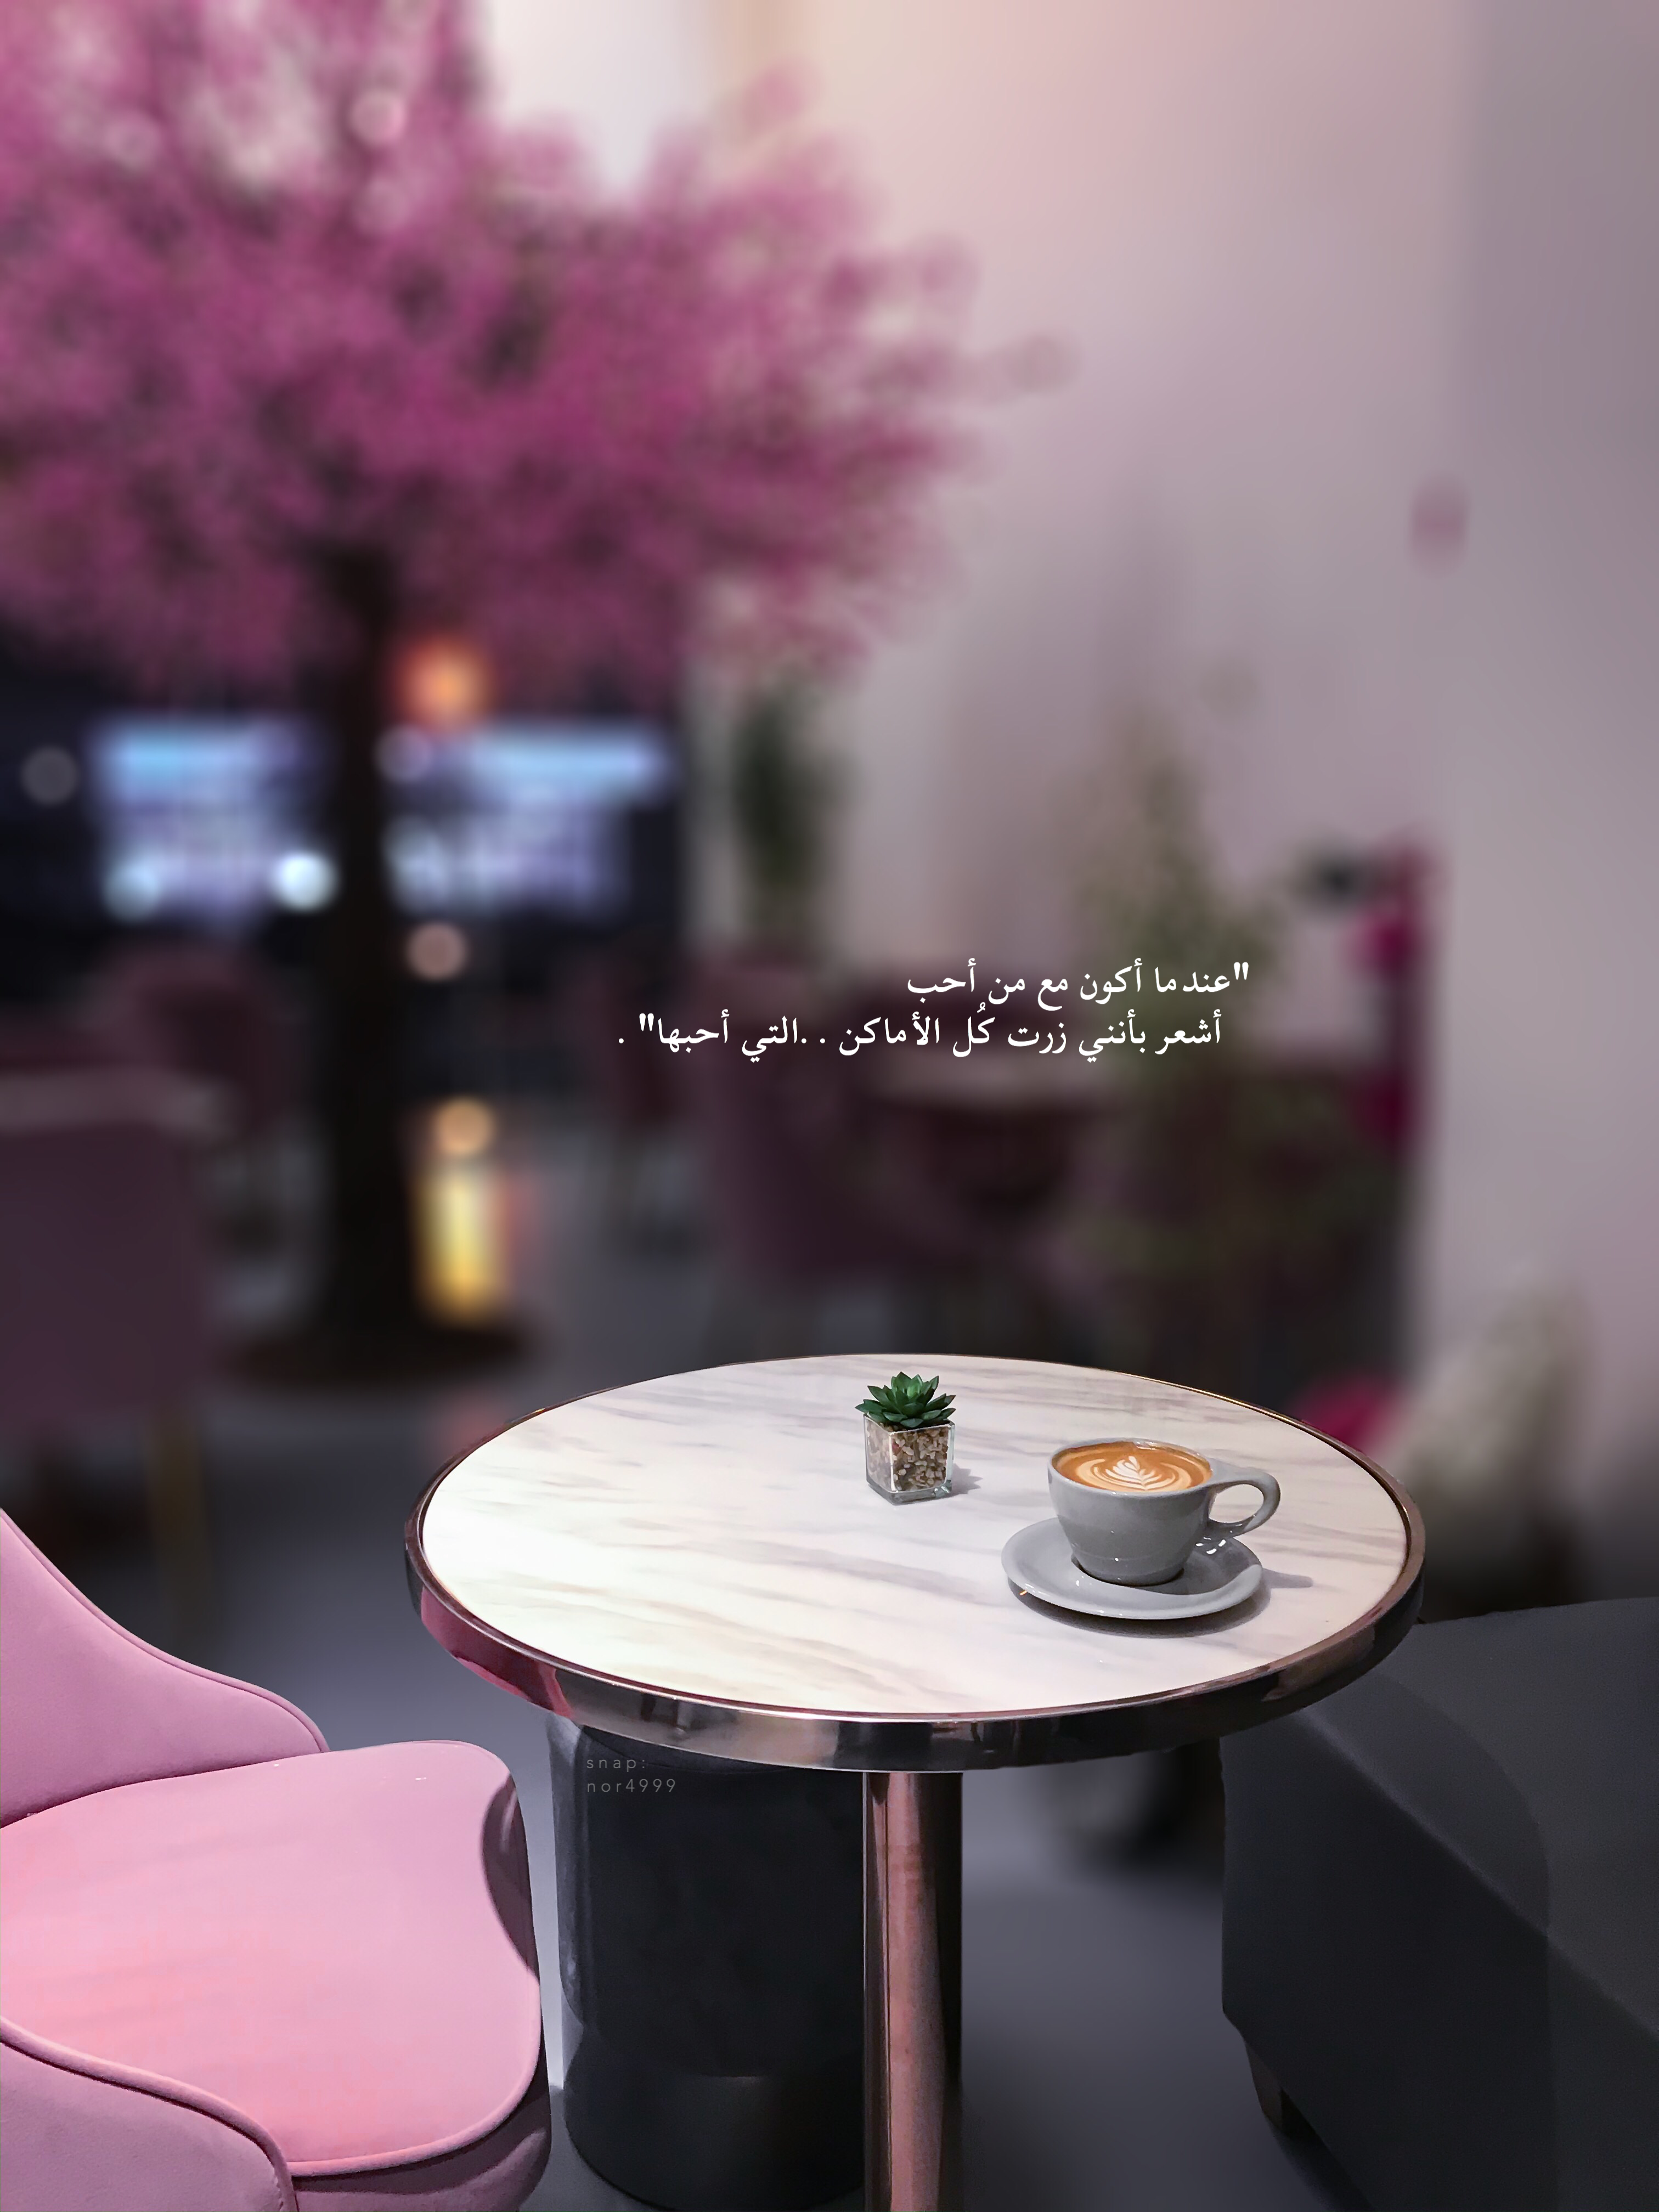 Pin By Alshehhiamna On Arabic Phrases I Love Coffee Arabic Phrases Arabic Quotes